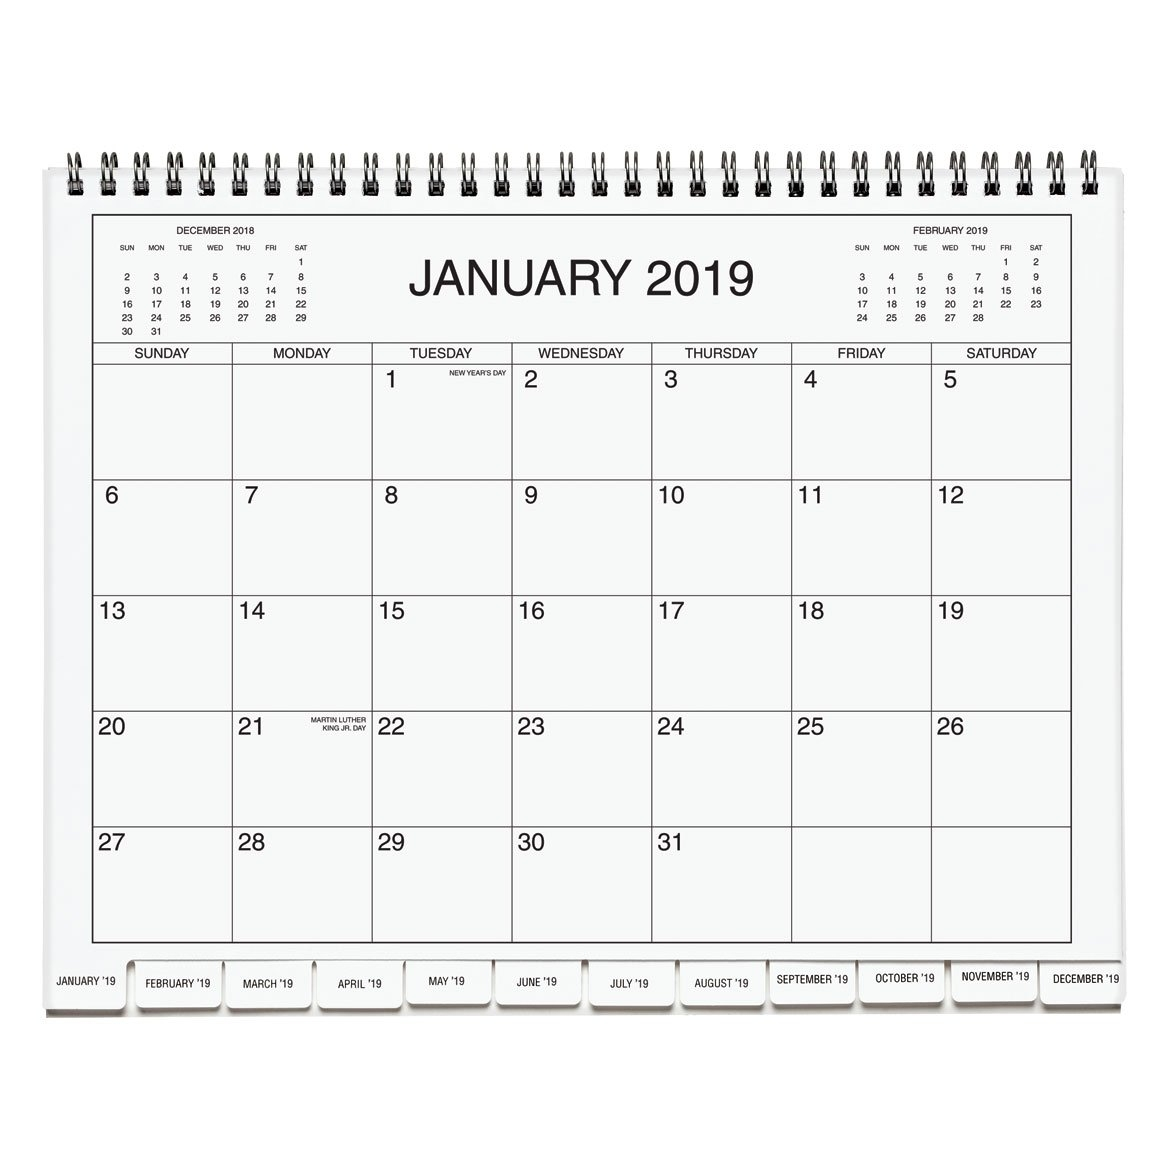 3 Year Calendar 2019-2021 - Three Year Calendar - Miles Kimball 3 Year Calendar 2019 To 2021